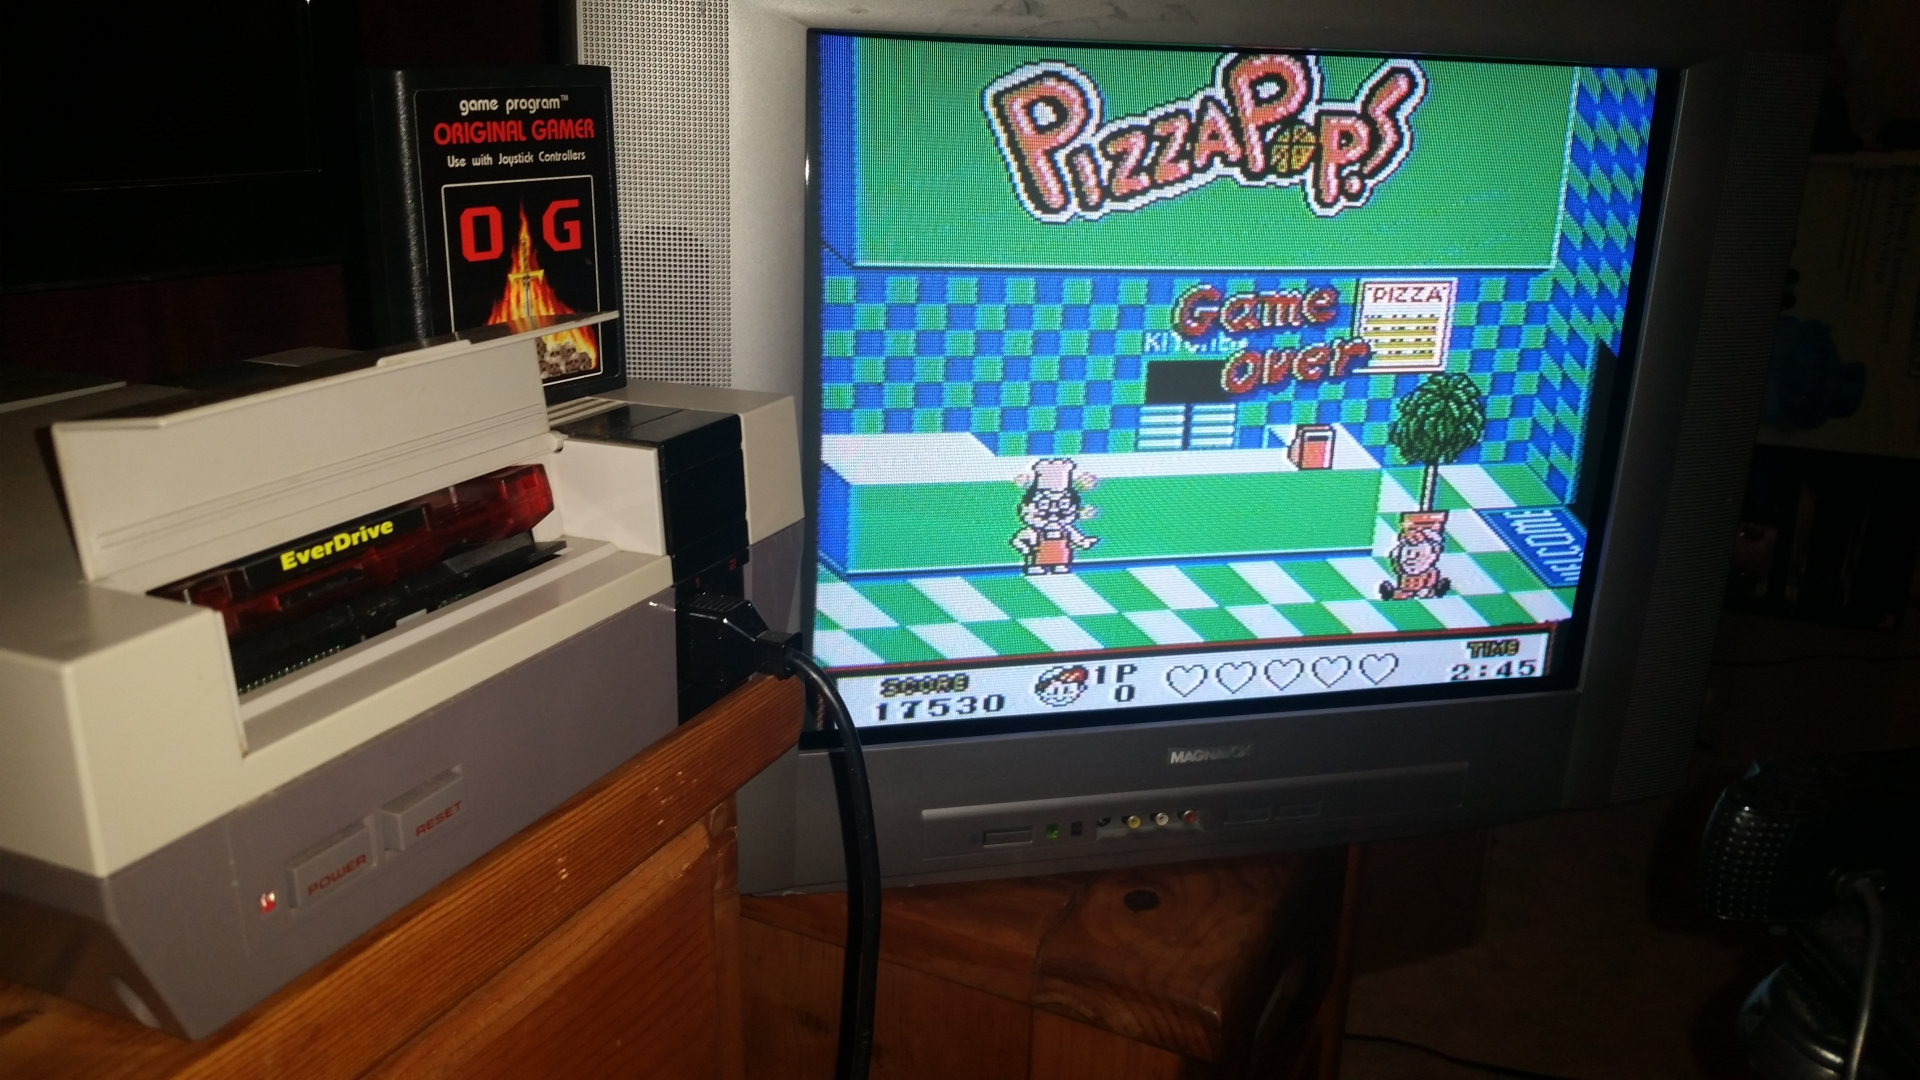 OriginalGamer: Pizza Pop! (NES/Famicom) 17,530 points on 2016-09-19 00:55:12